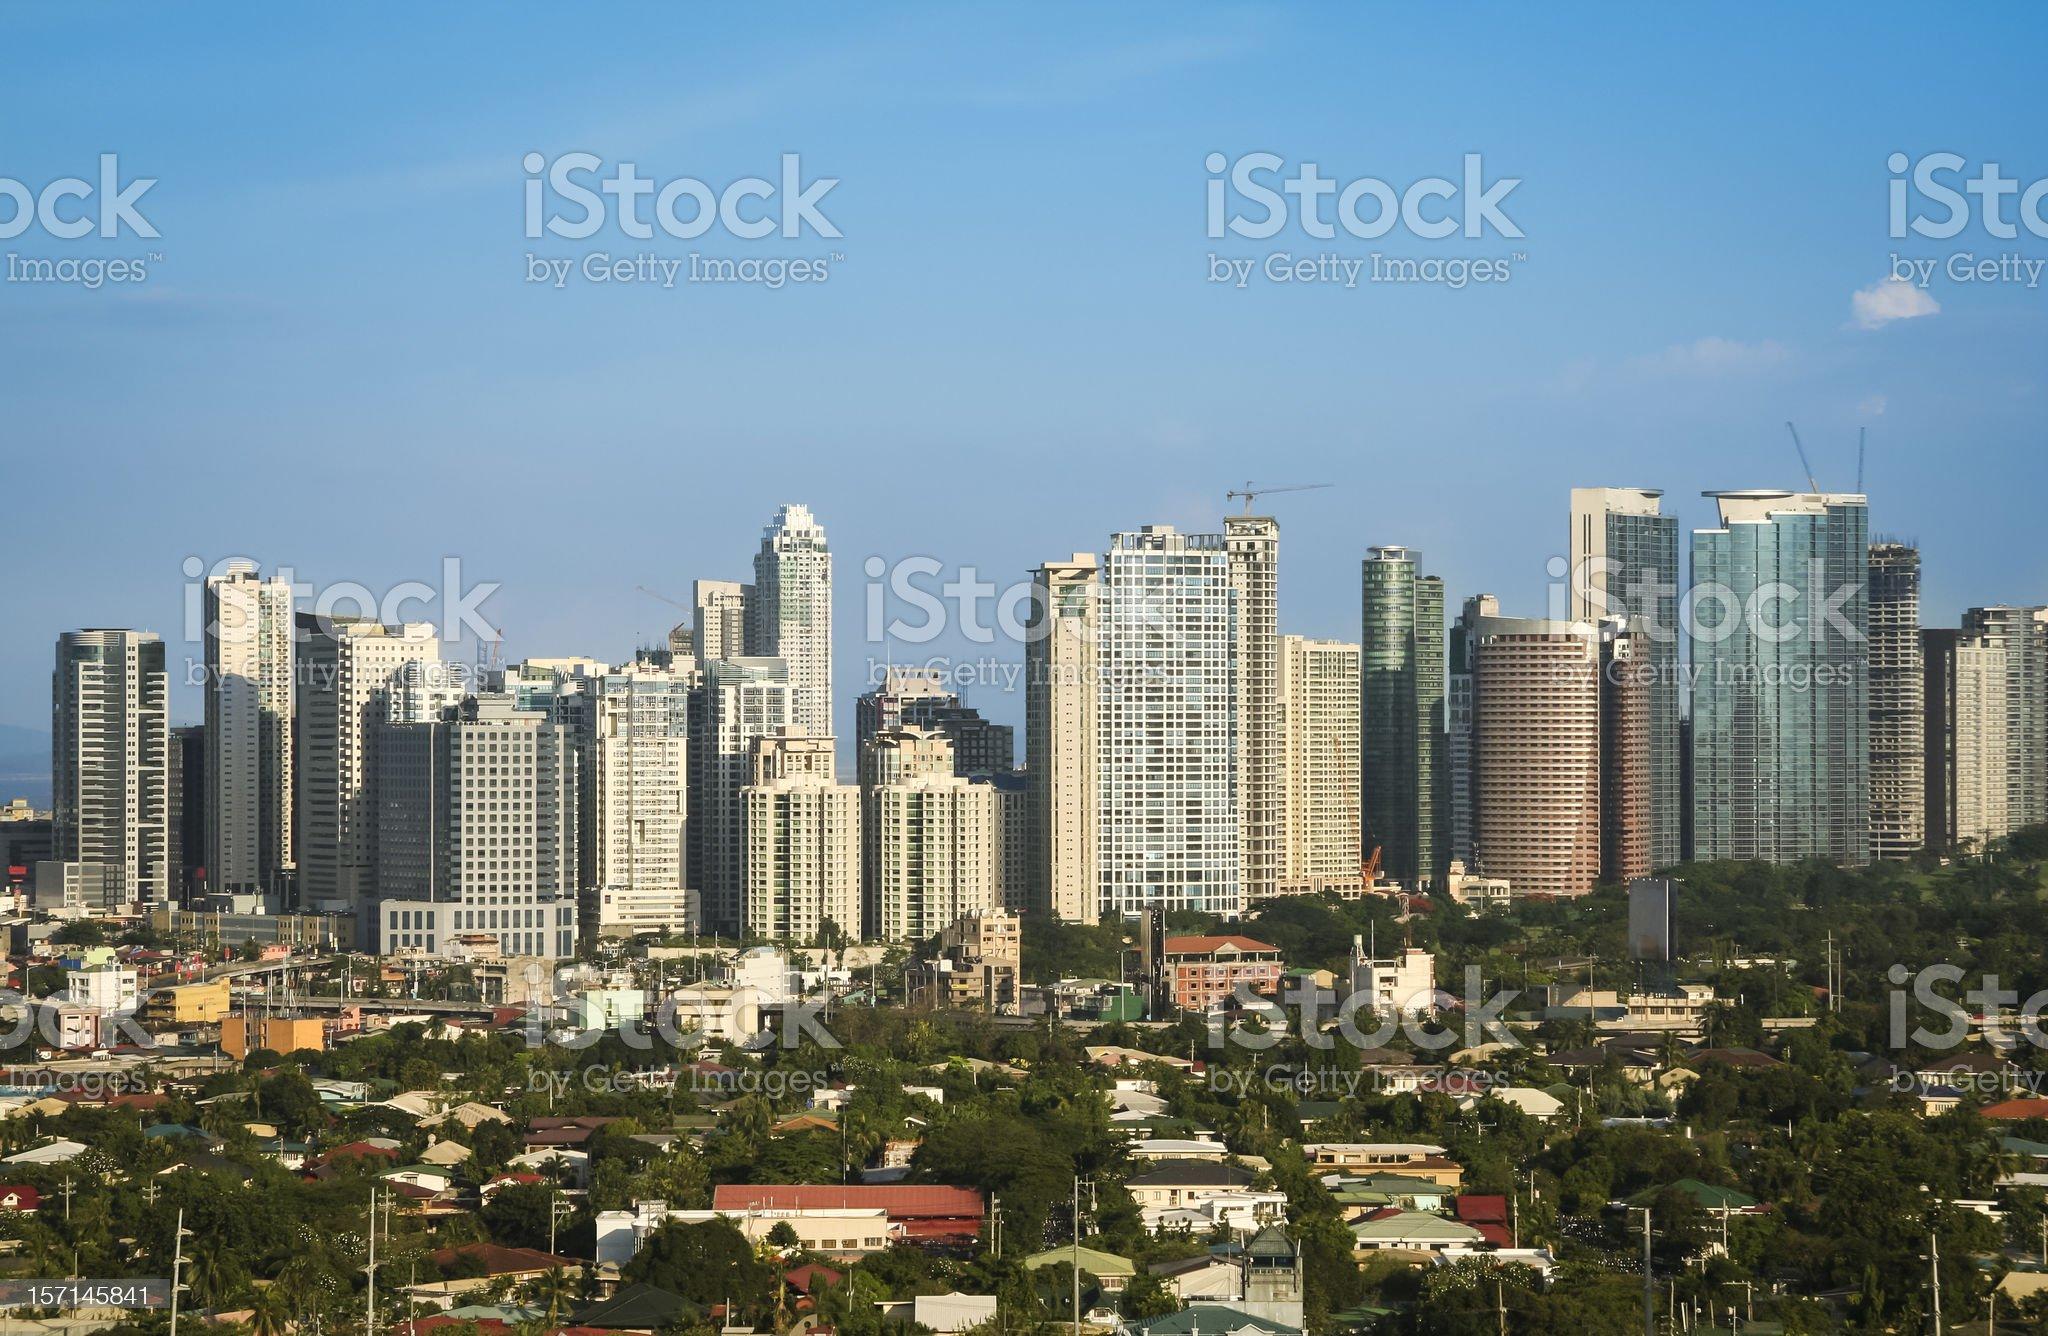 Skyline of Fort Bonifacio located in Makati City Philippines royalty-free stock photo